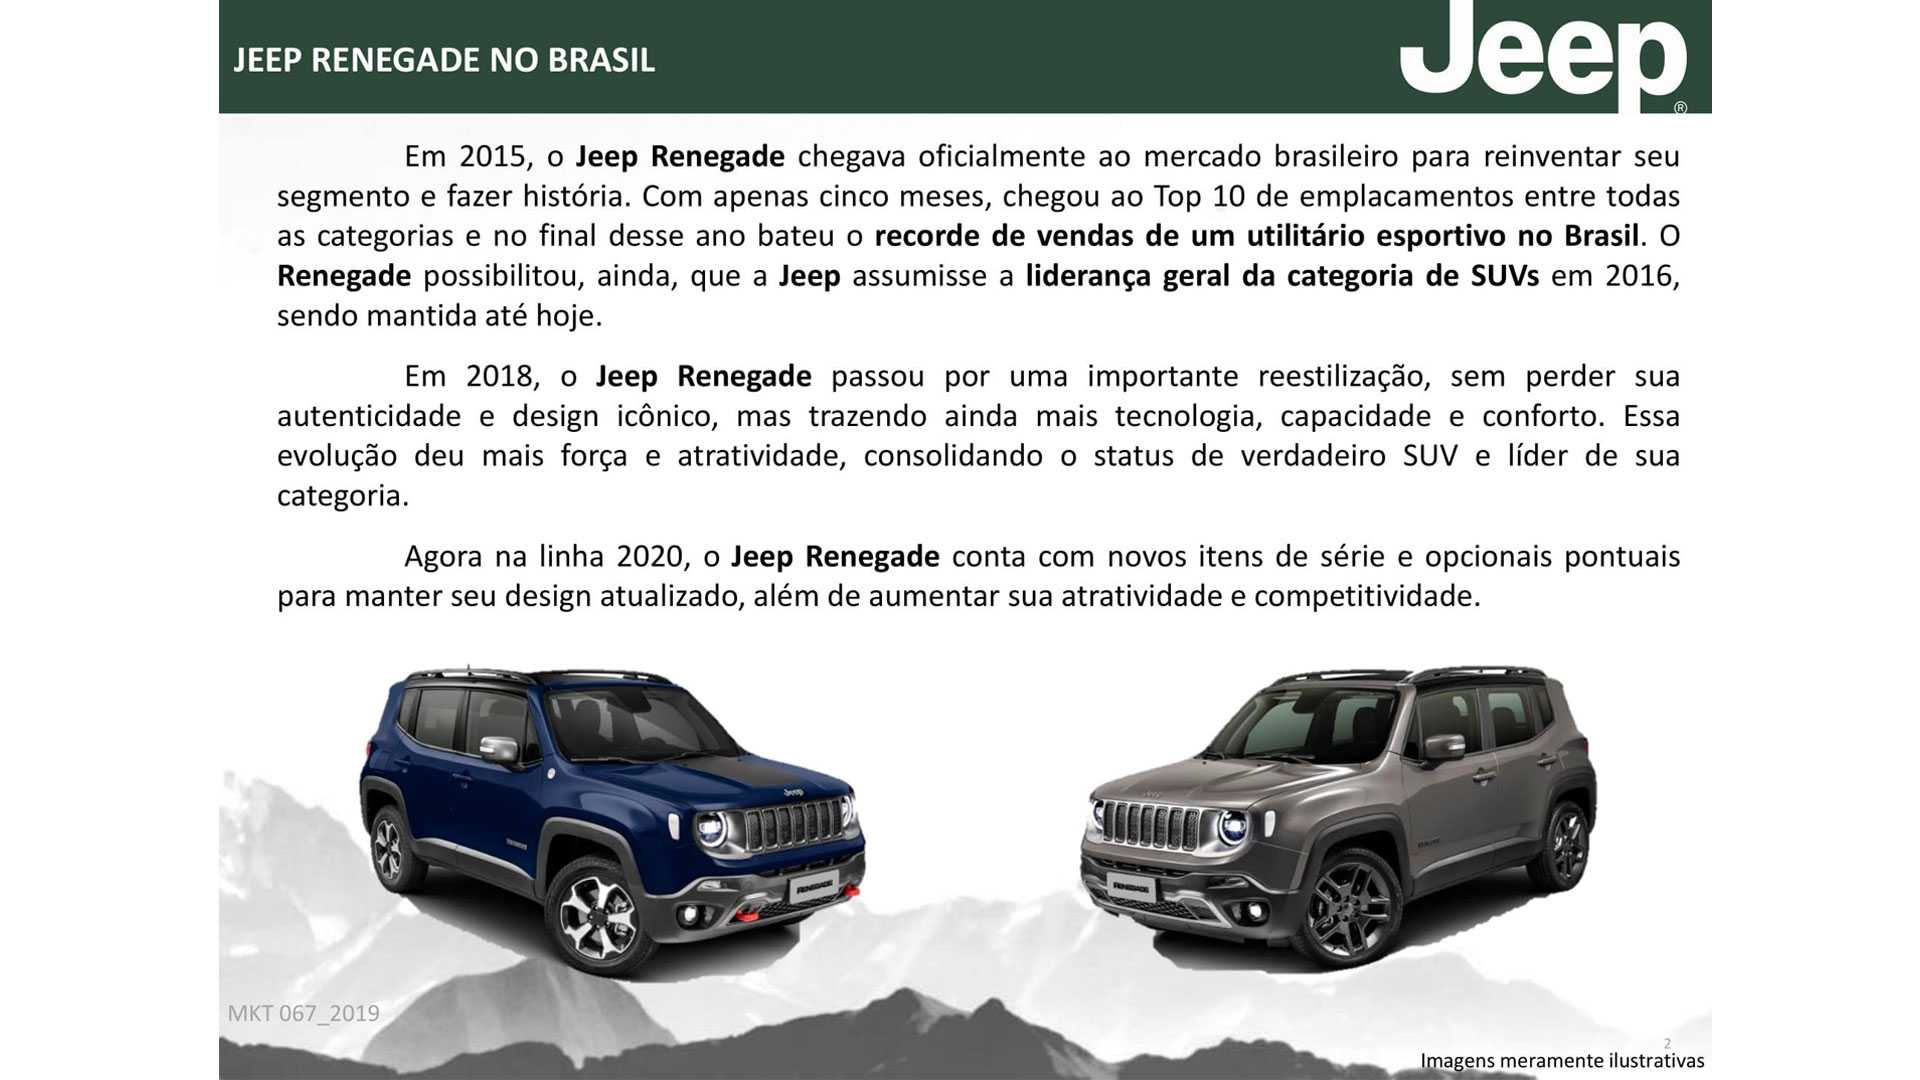 Jeep Renegade 2020 perderá câmbio manual - Portal Lubes